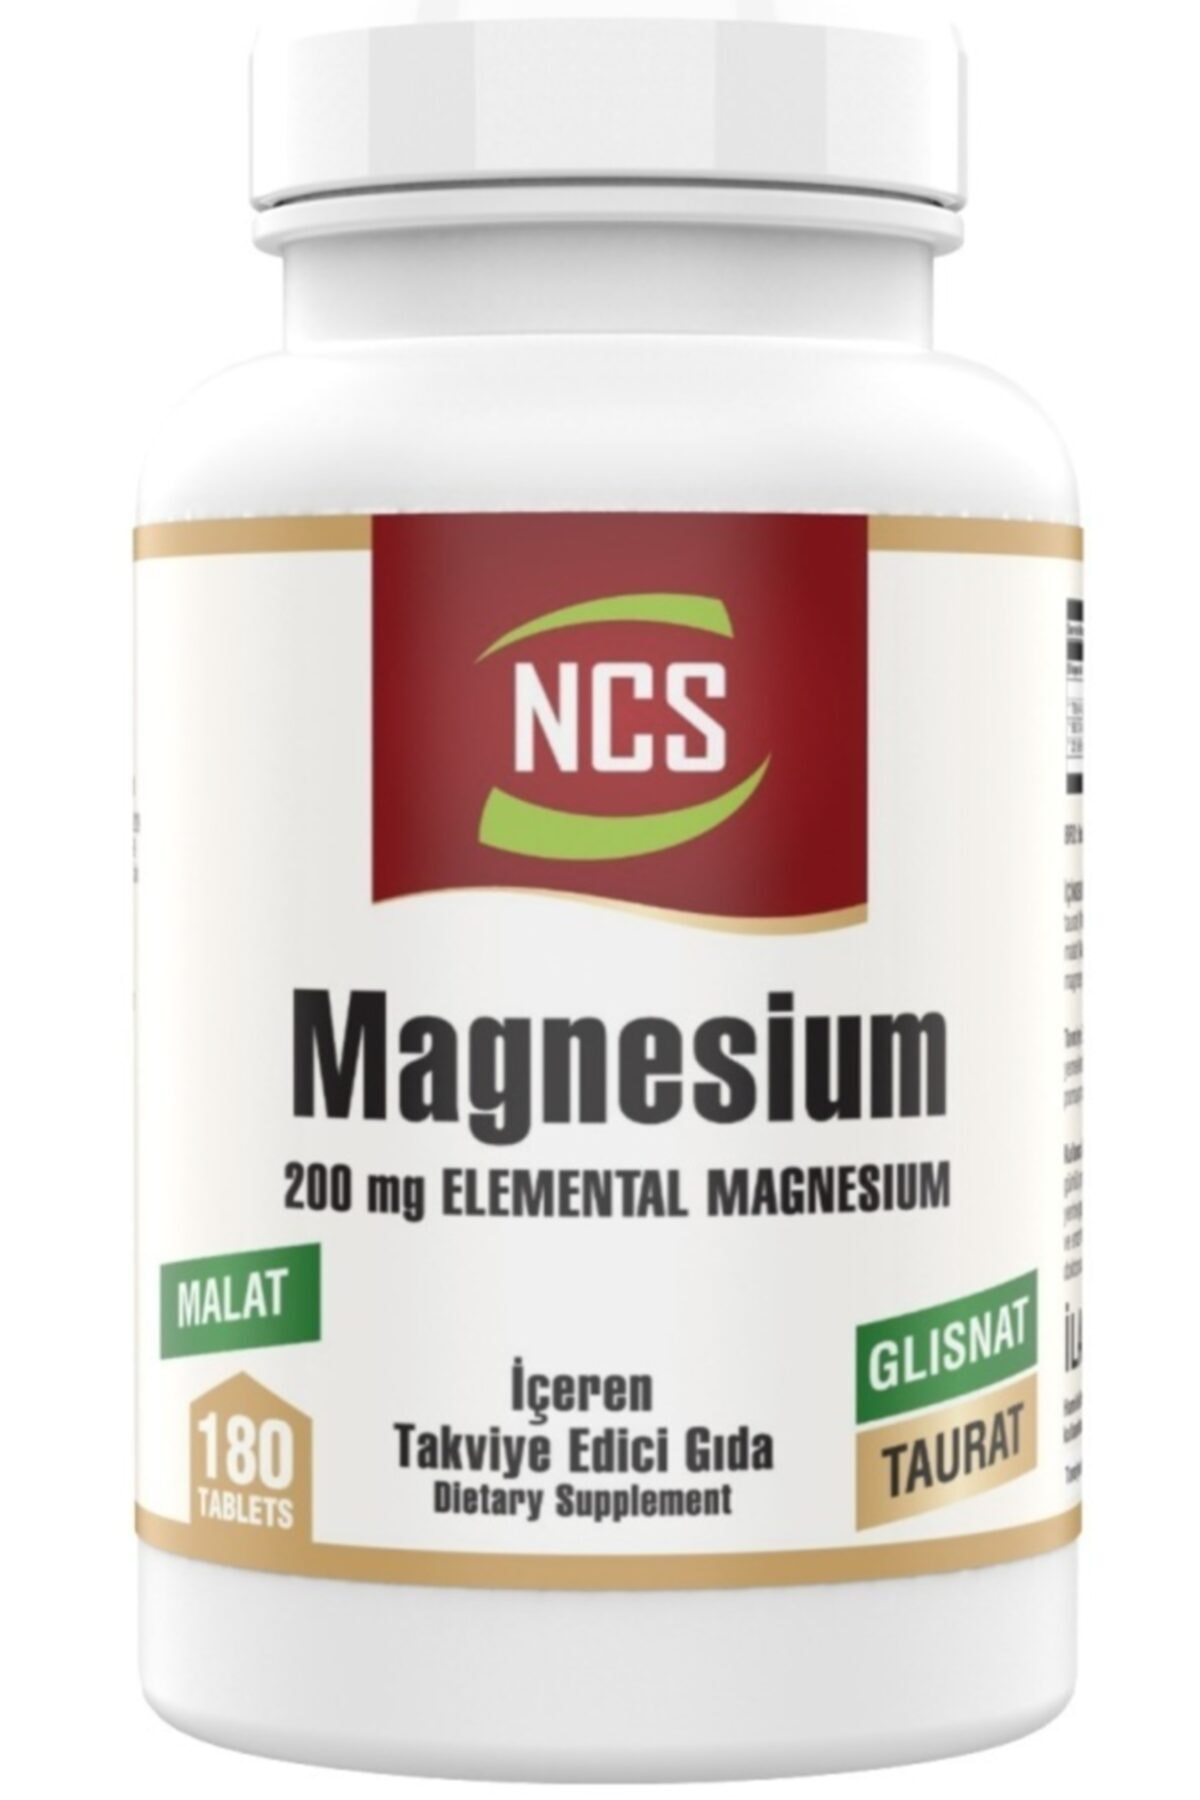 NCS Magnesium Bisglisinat Malat Taurat 180 Tablet Magnezyum Element Formül 1